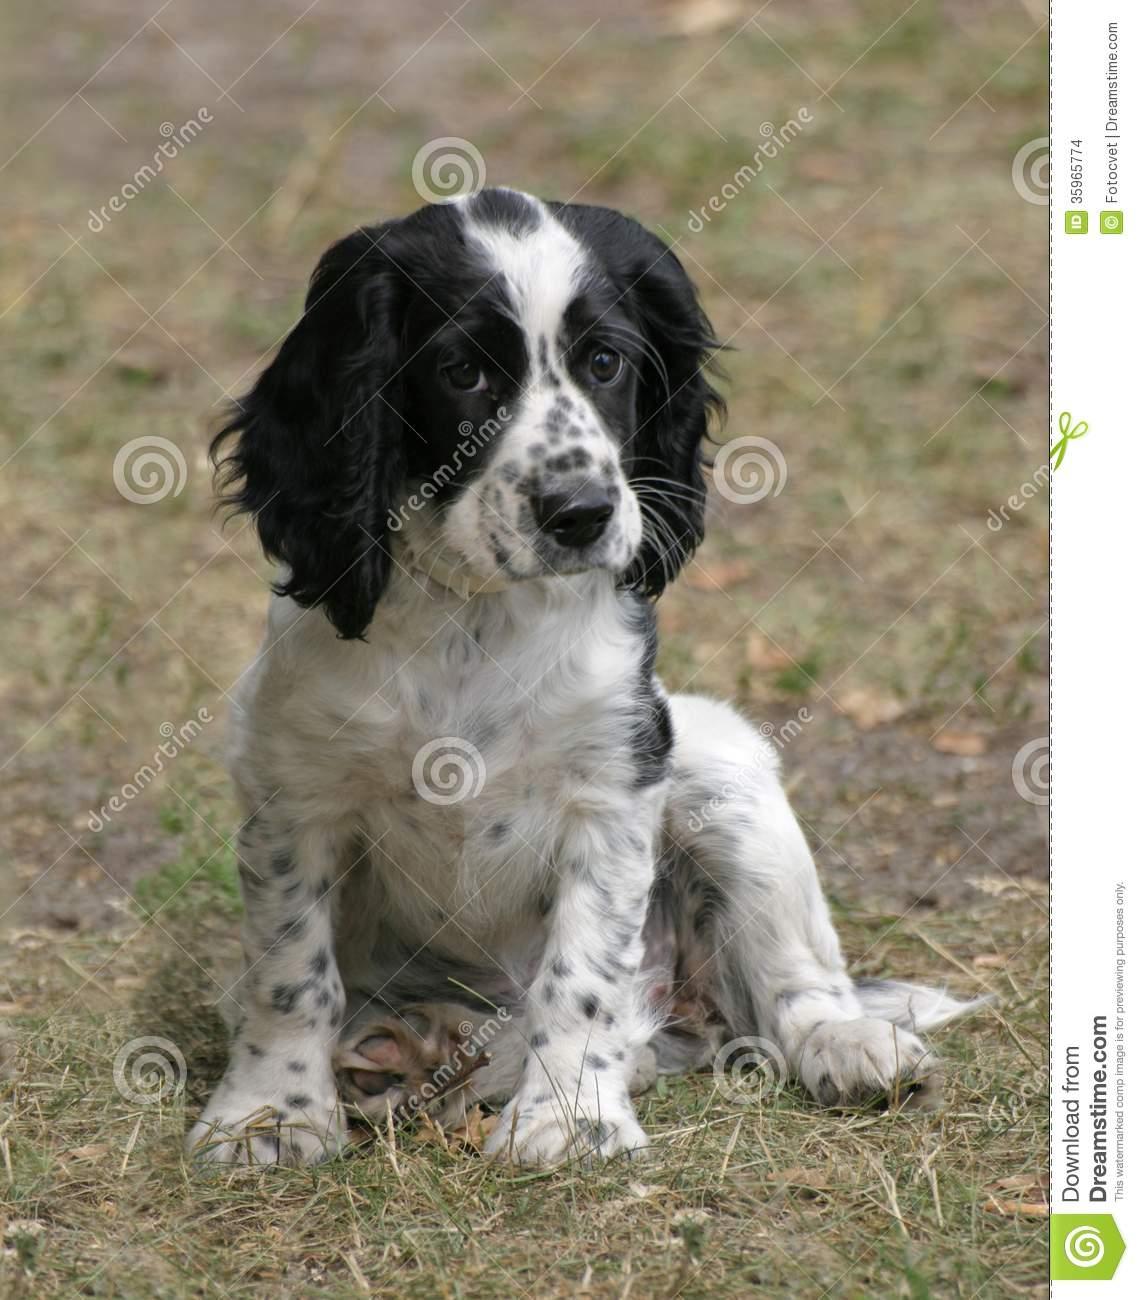 Russian Spaniel Puppies: Cute Black Cocker Spaniel Puppies Breed